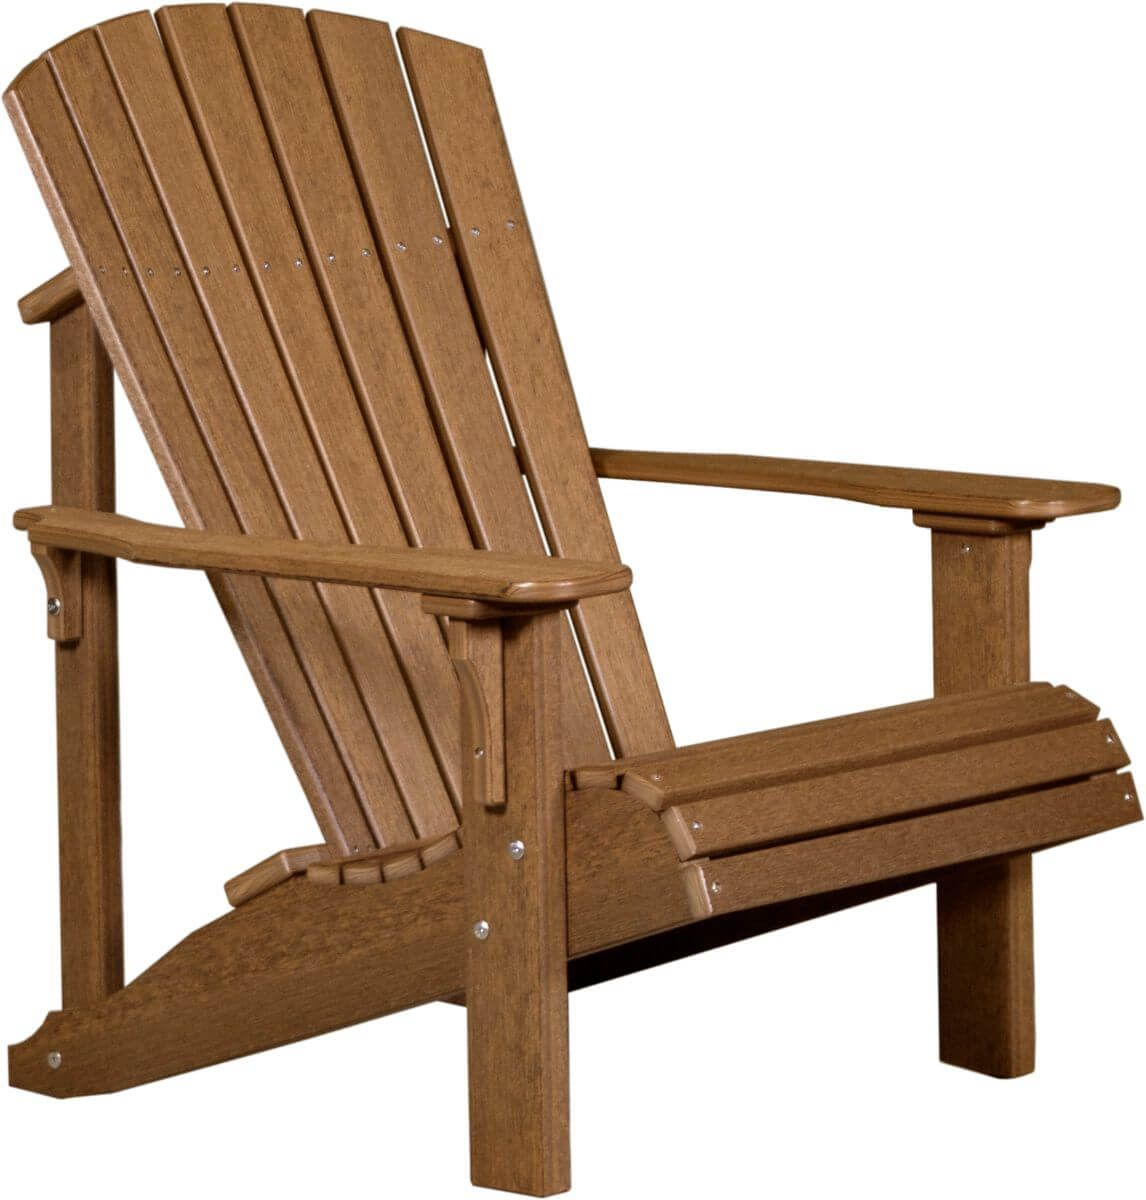 Antique Mahogany Rockaway Adirondack Chair